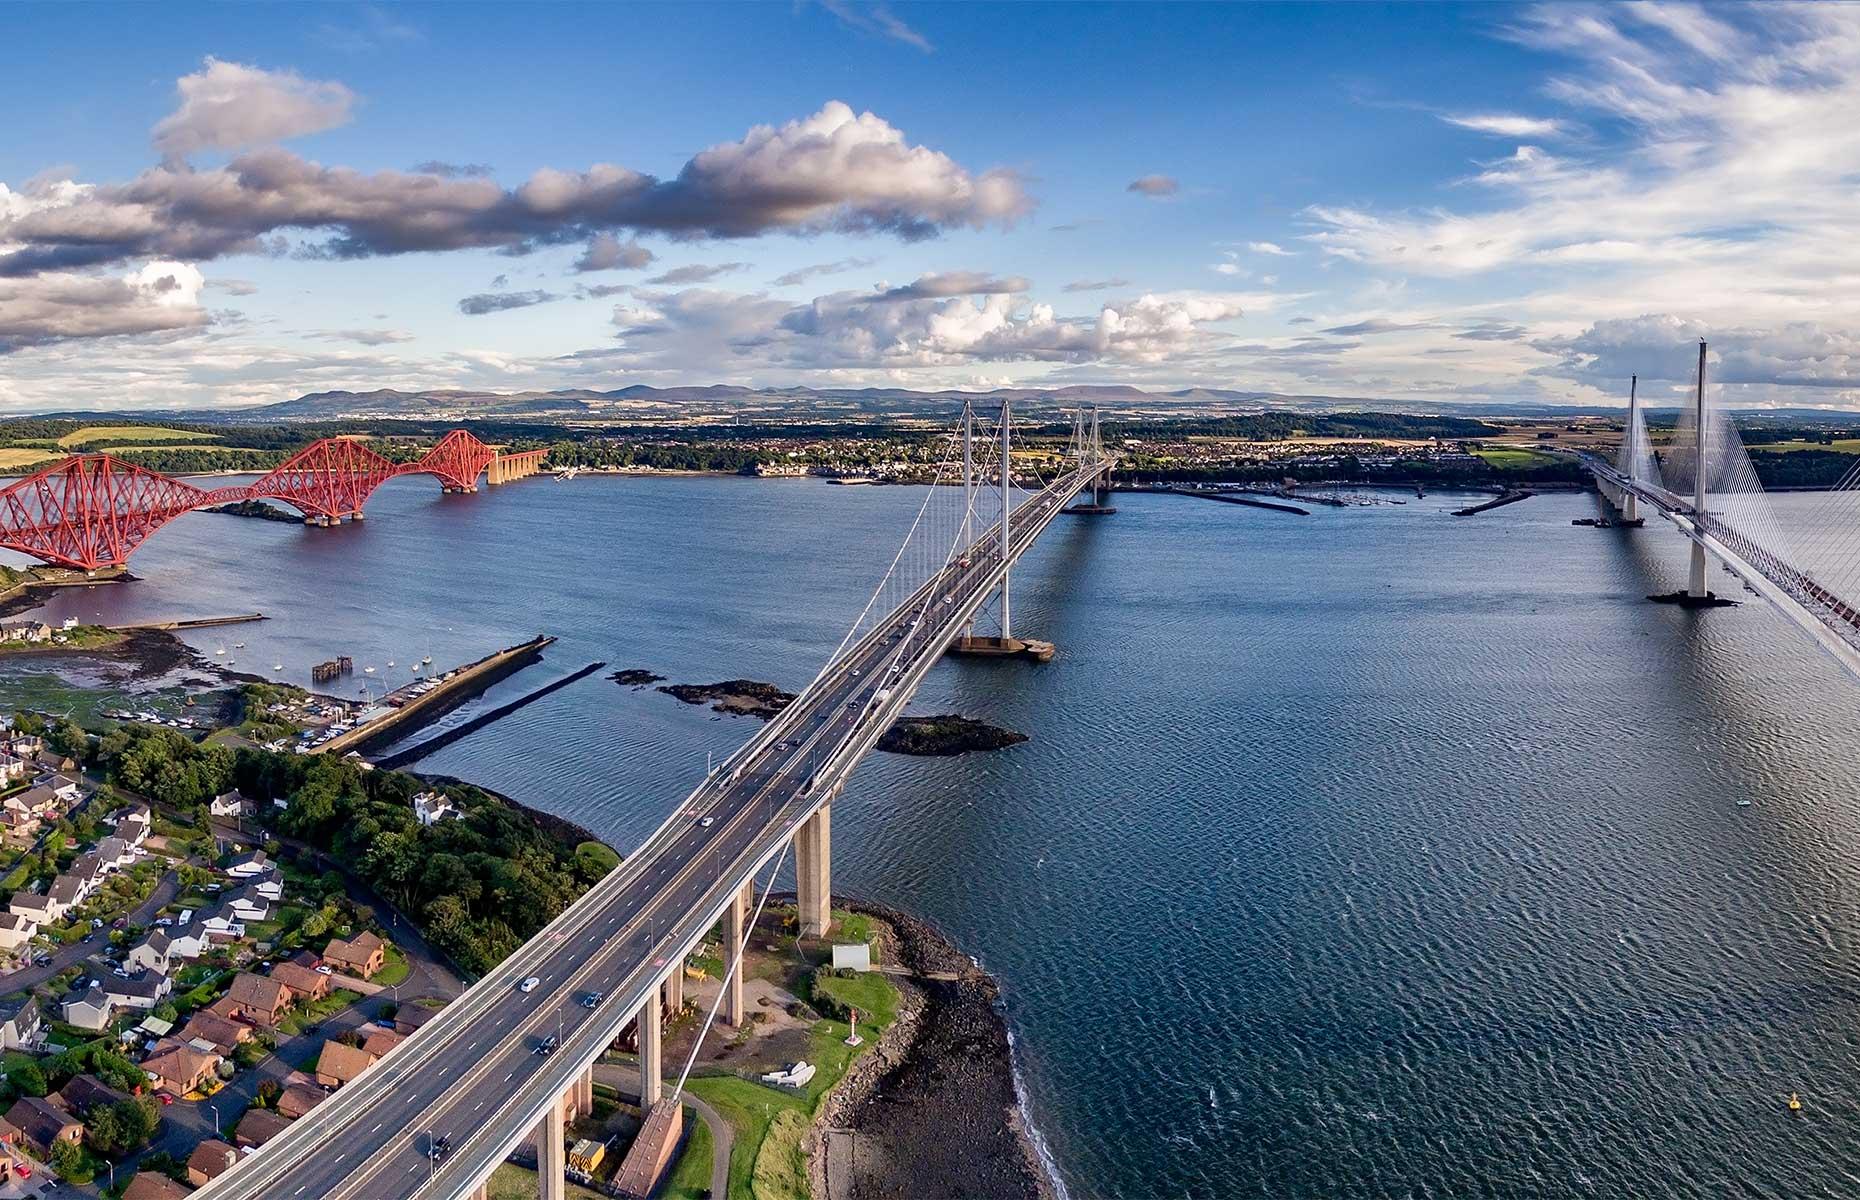 Three bridges at South Queensferry, Scotland (Image: Ulmus Media/Shutterstock)